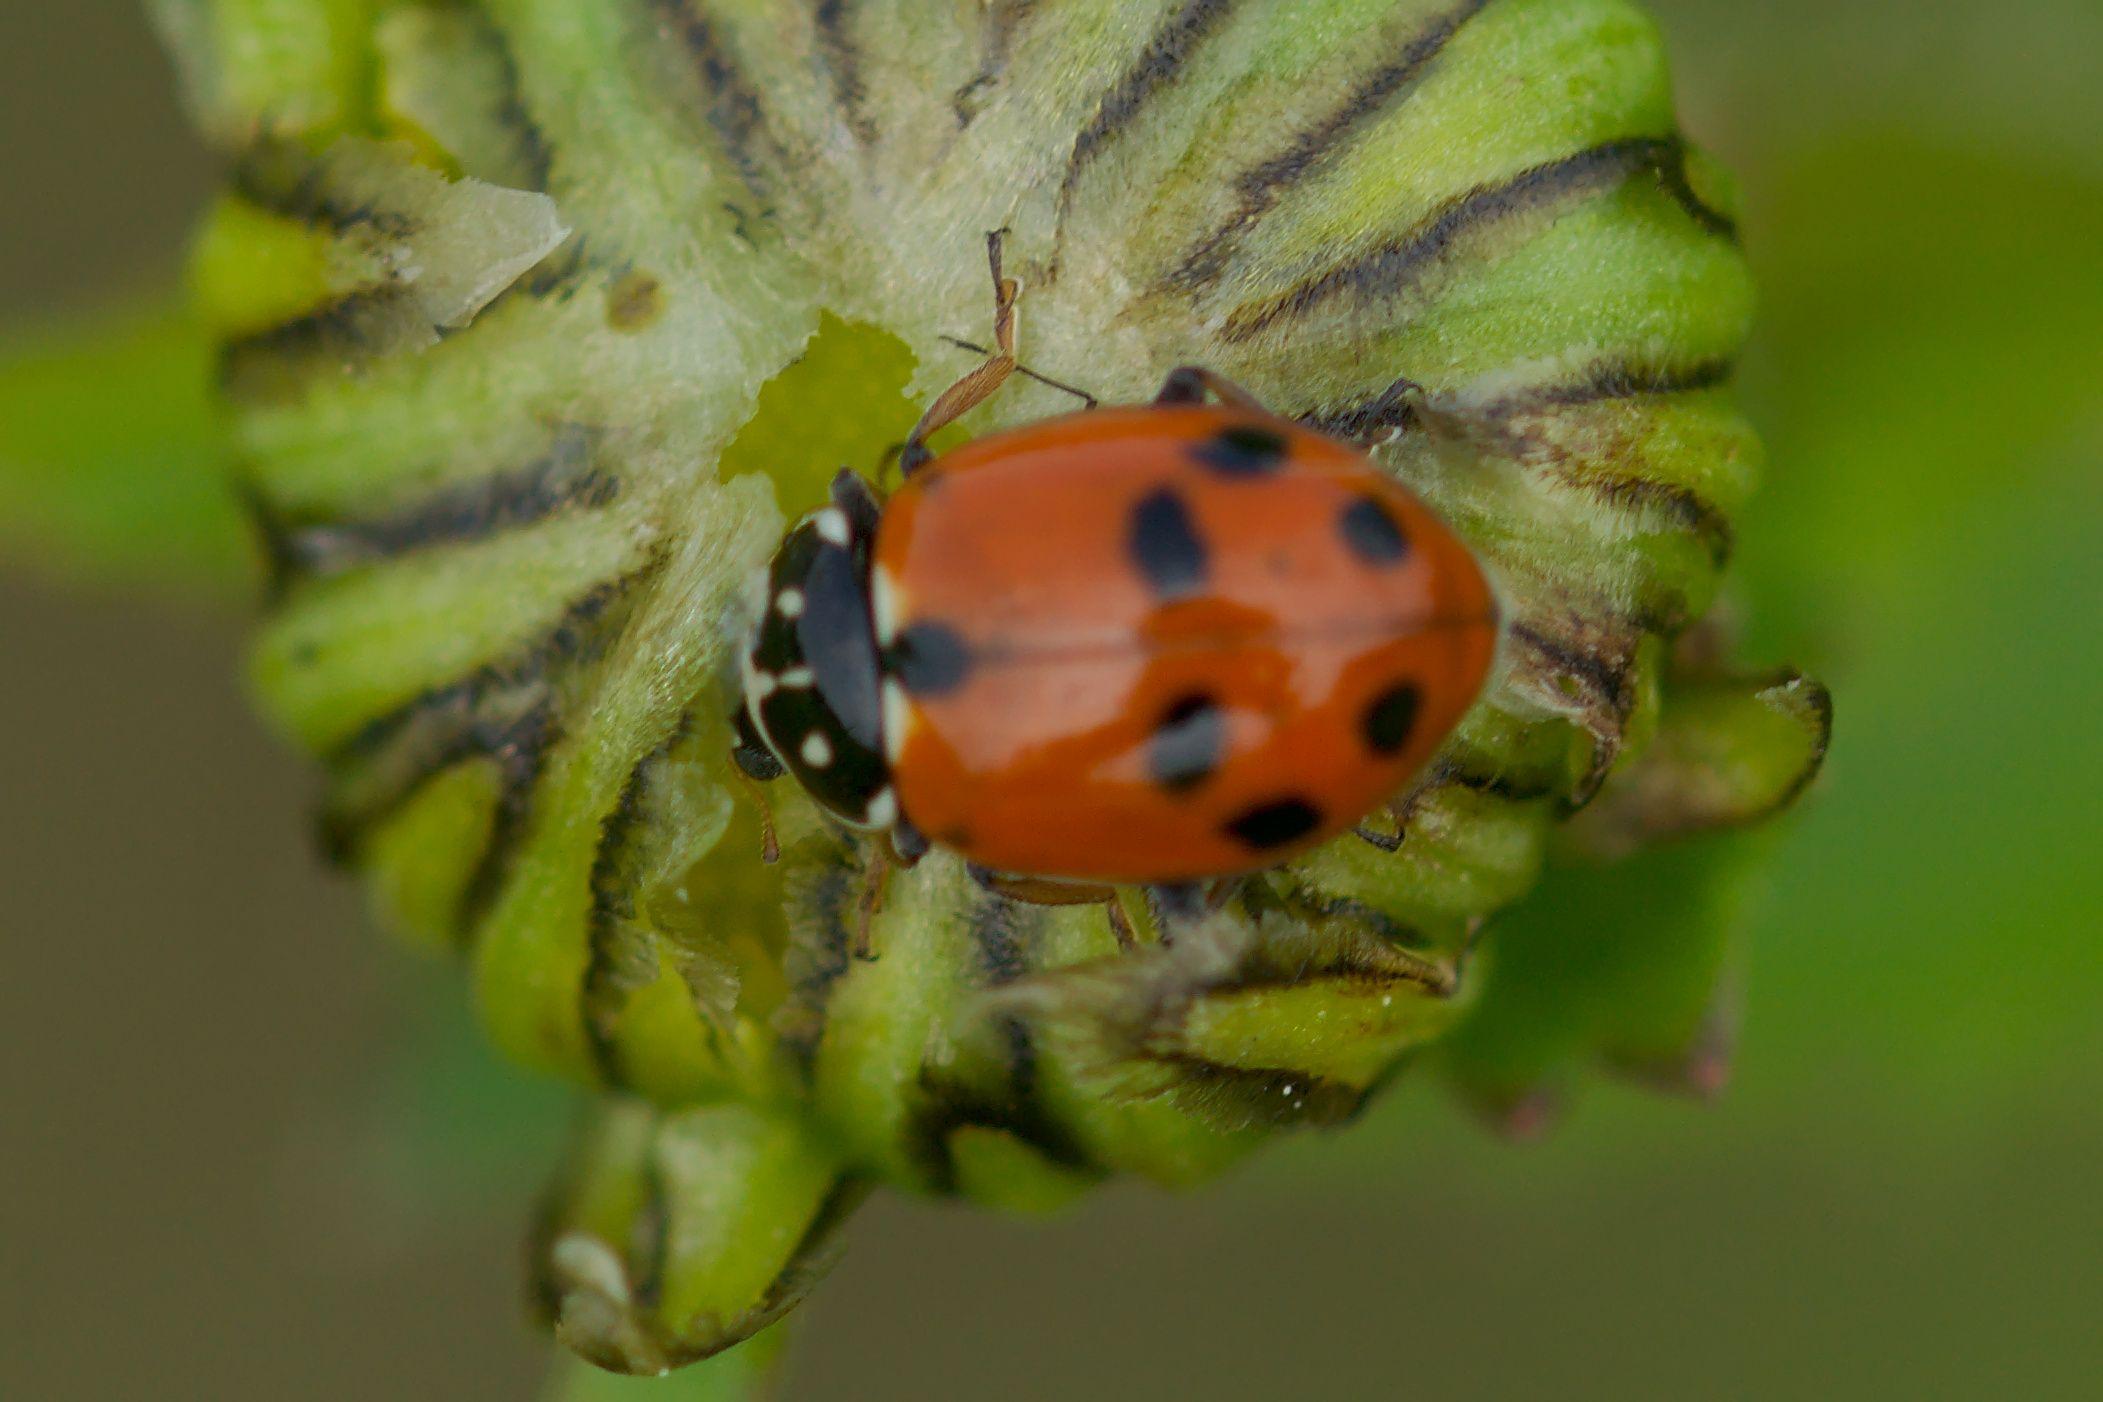 "<a href=""/hippodamia-variegata/"" target=""_blank"" rel=""noopener noreferrer""><i>Hippodamia variegata</i> (Variabler Flach-Marienkäfer)</a>"